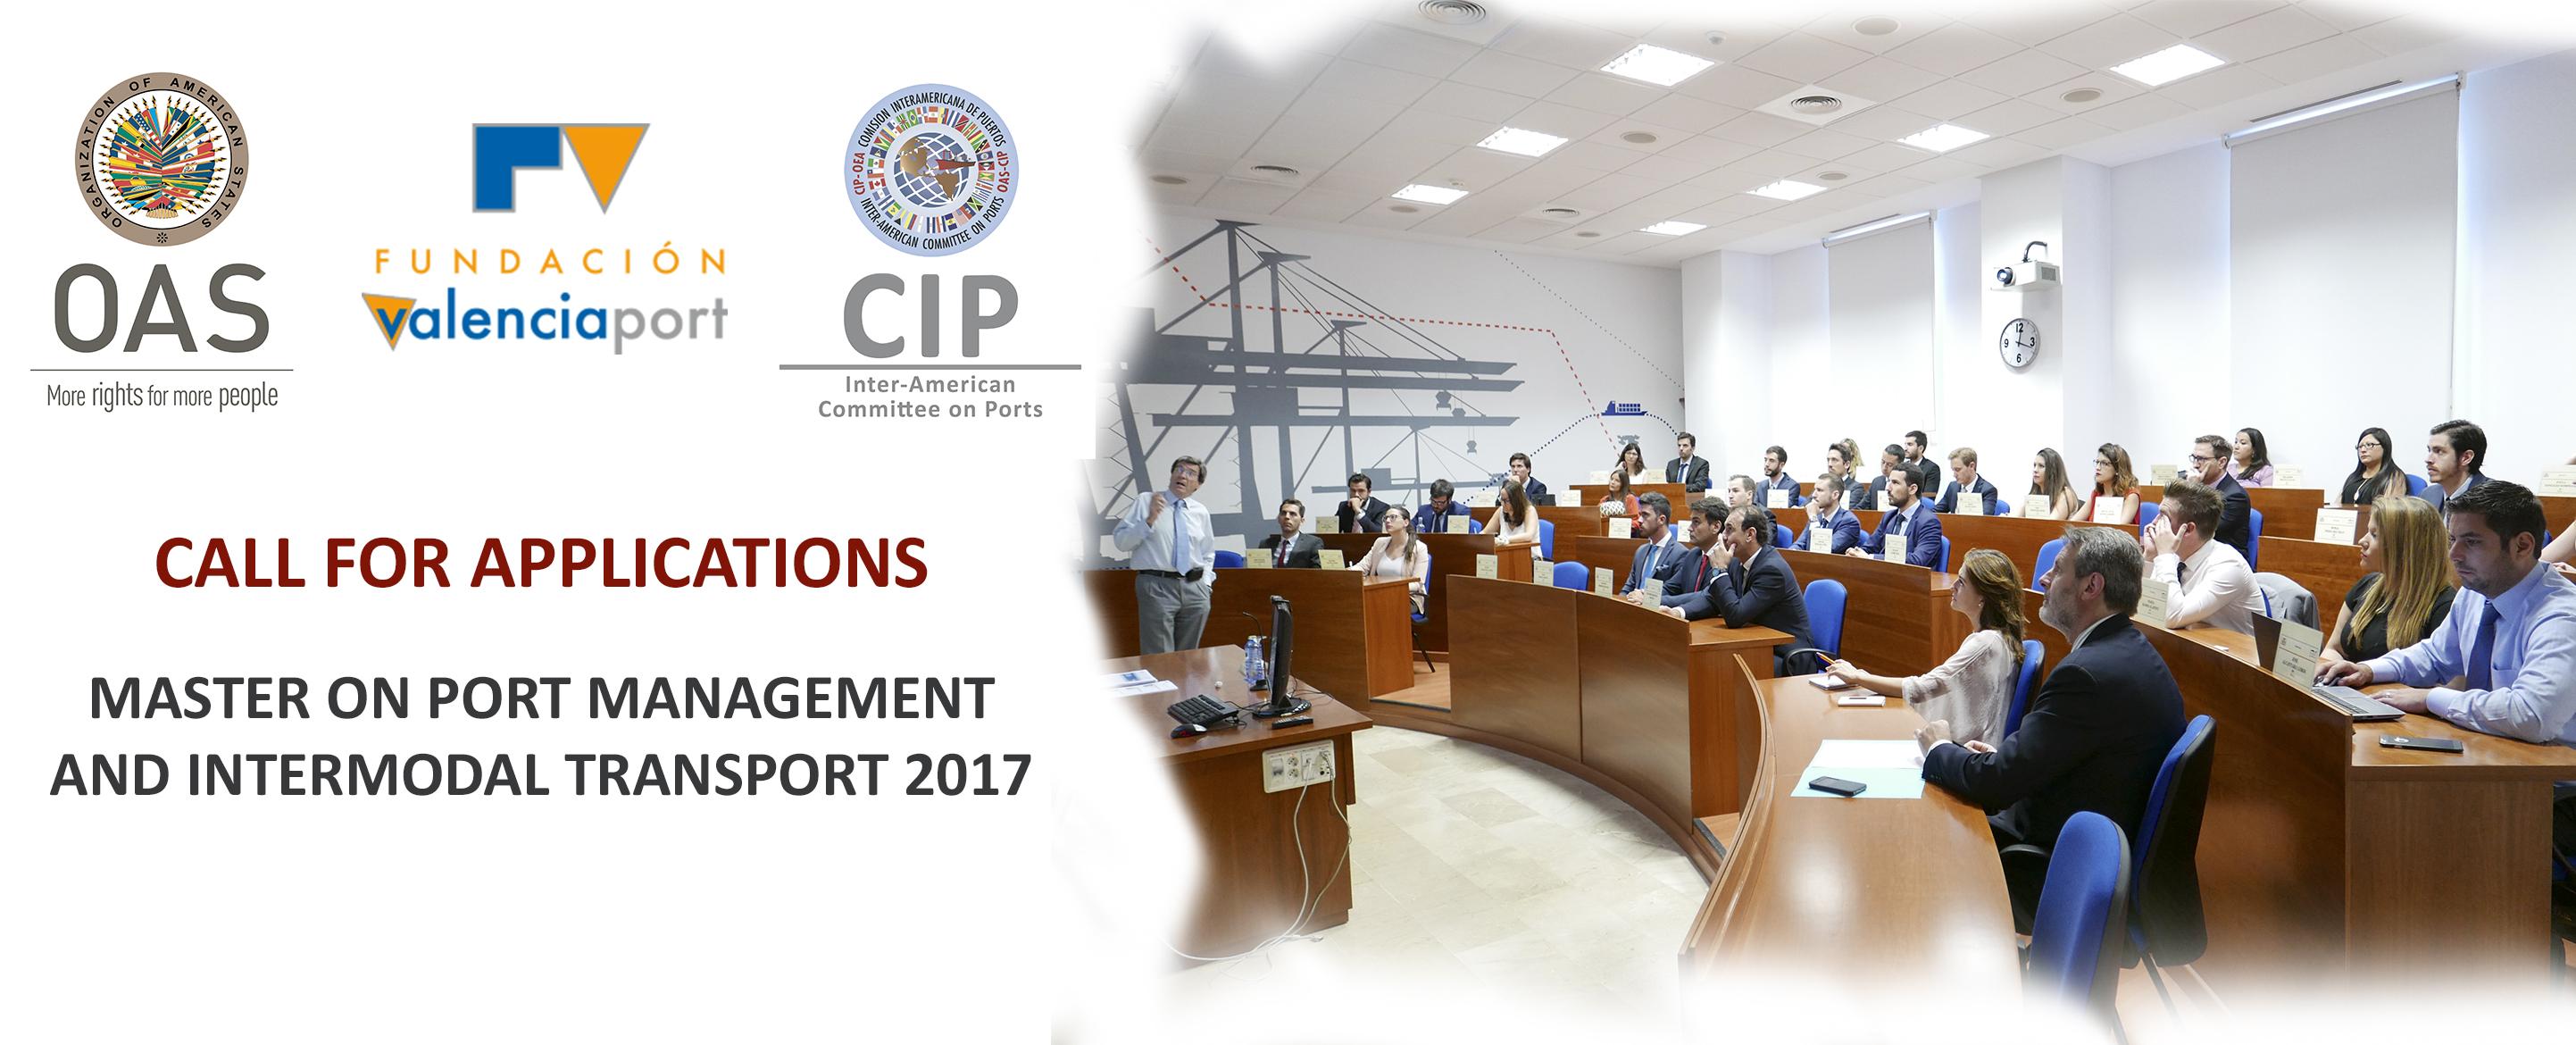 Master on Port Management and Intermodal Transport 2017